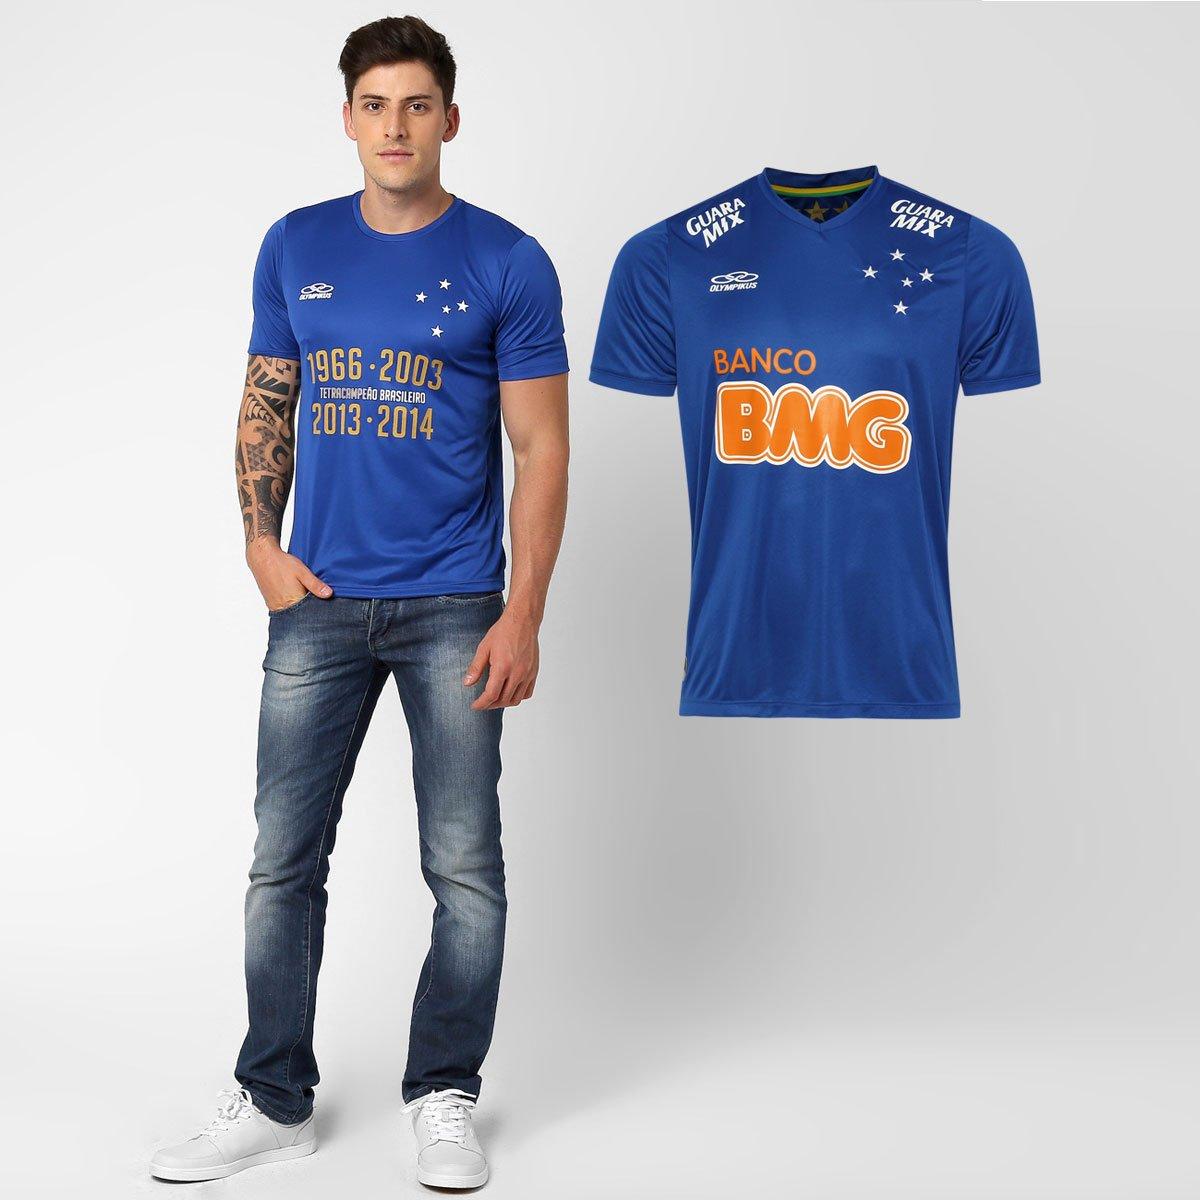 3654fe5cf8784 Kit Olympikus Cruzeiro - Camisa I 2014 + Camiseta Tetracampeão Brasil.